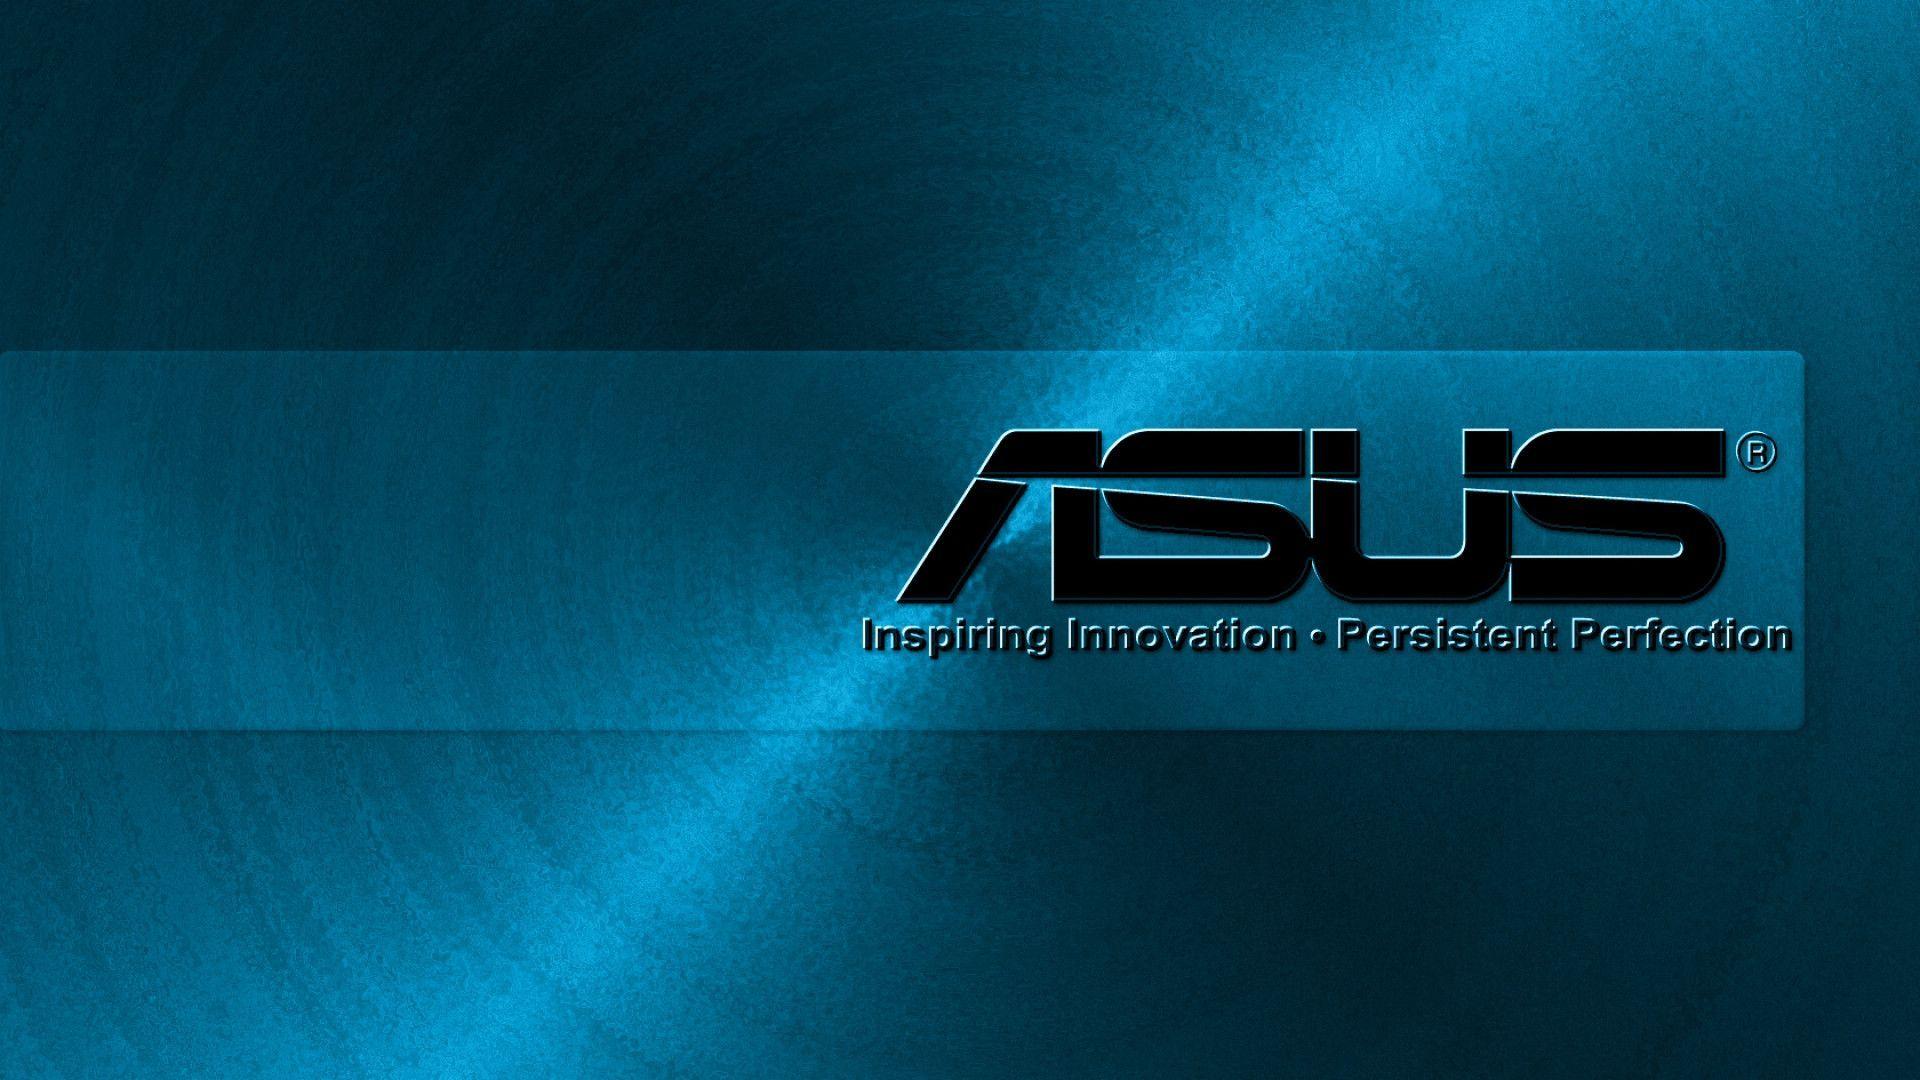 Asus HD Wallpapers Backgrounds Wallpaper 1920×1080 Asus Hd